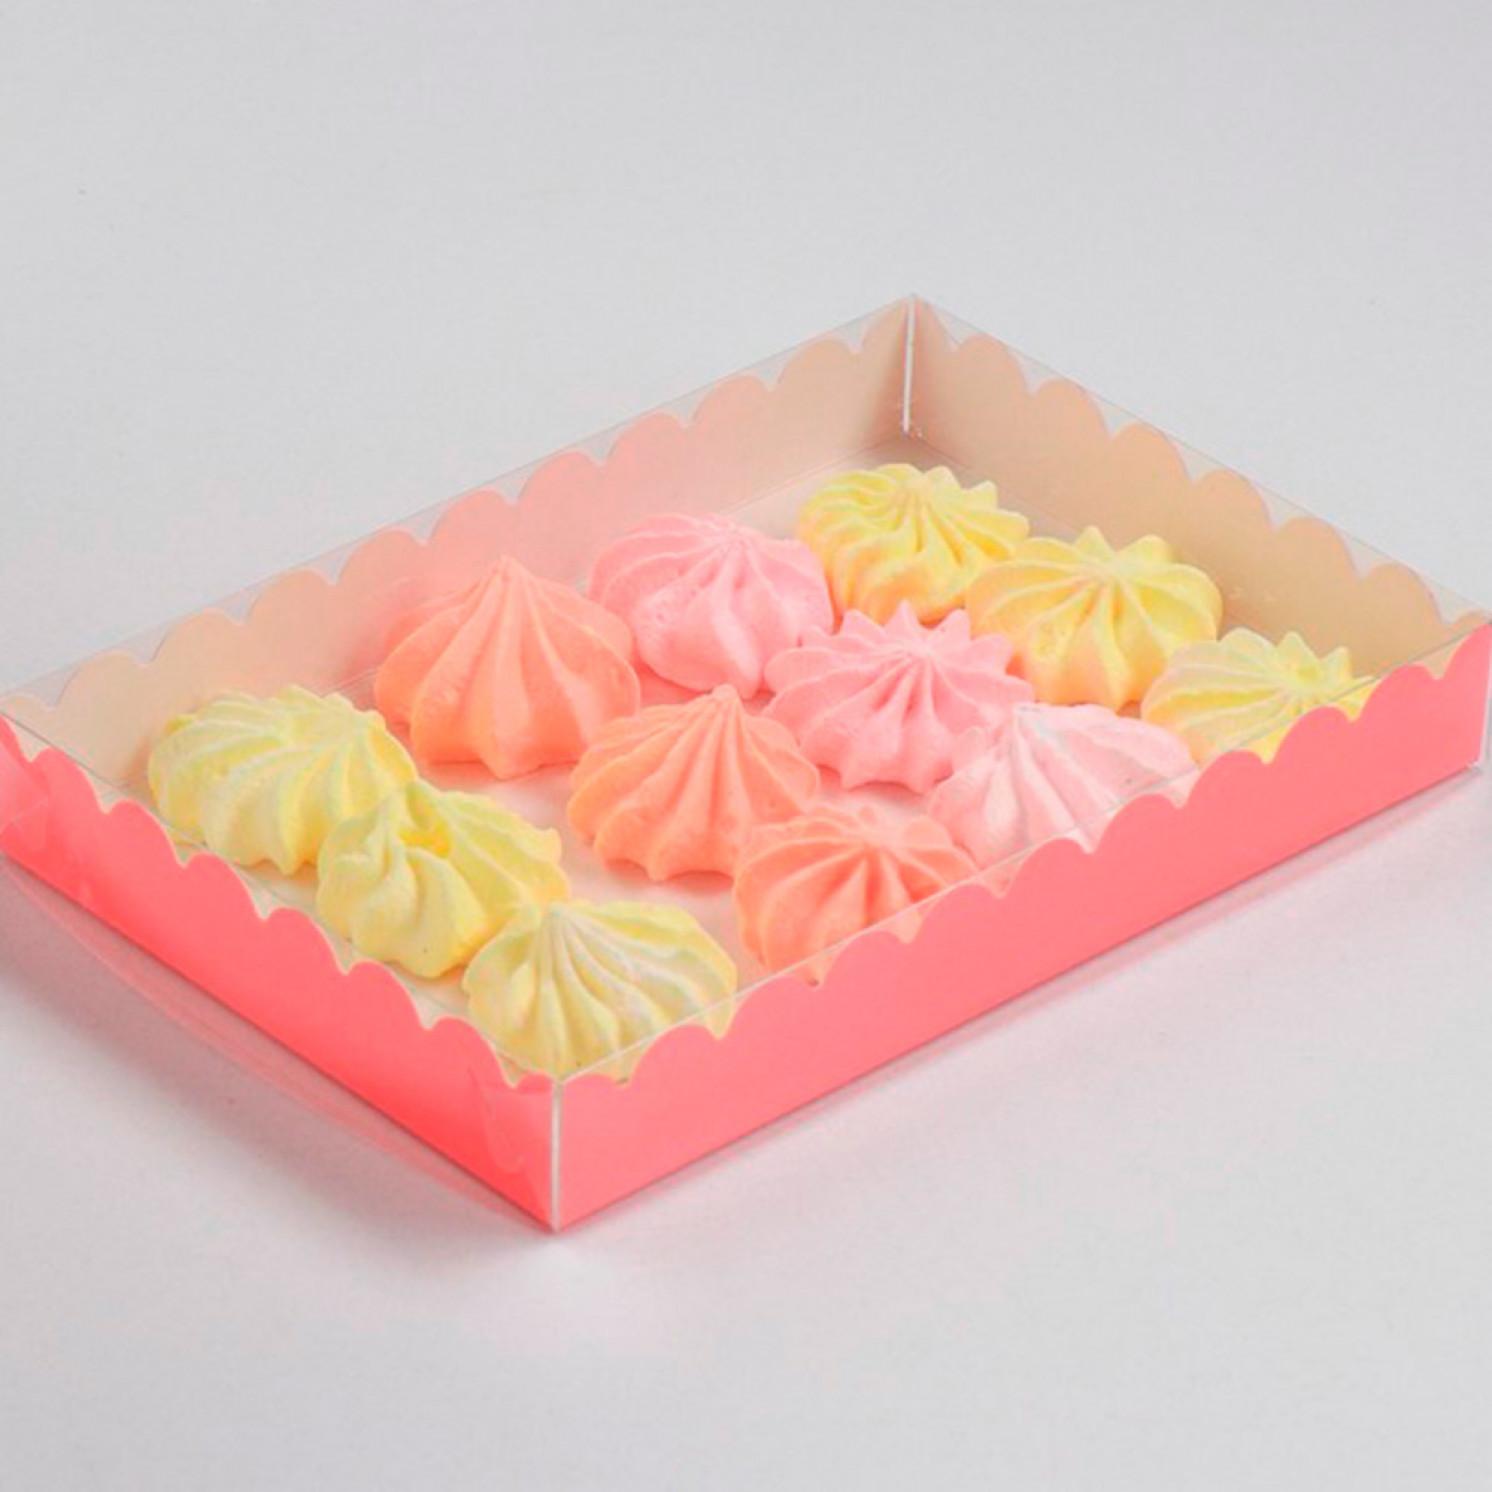 Коробочка для печенья, коралловый, 22 х 15 х 3 см